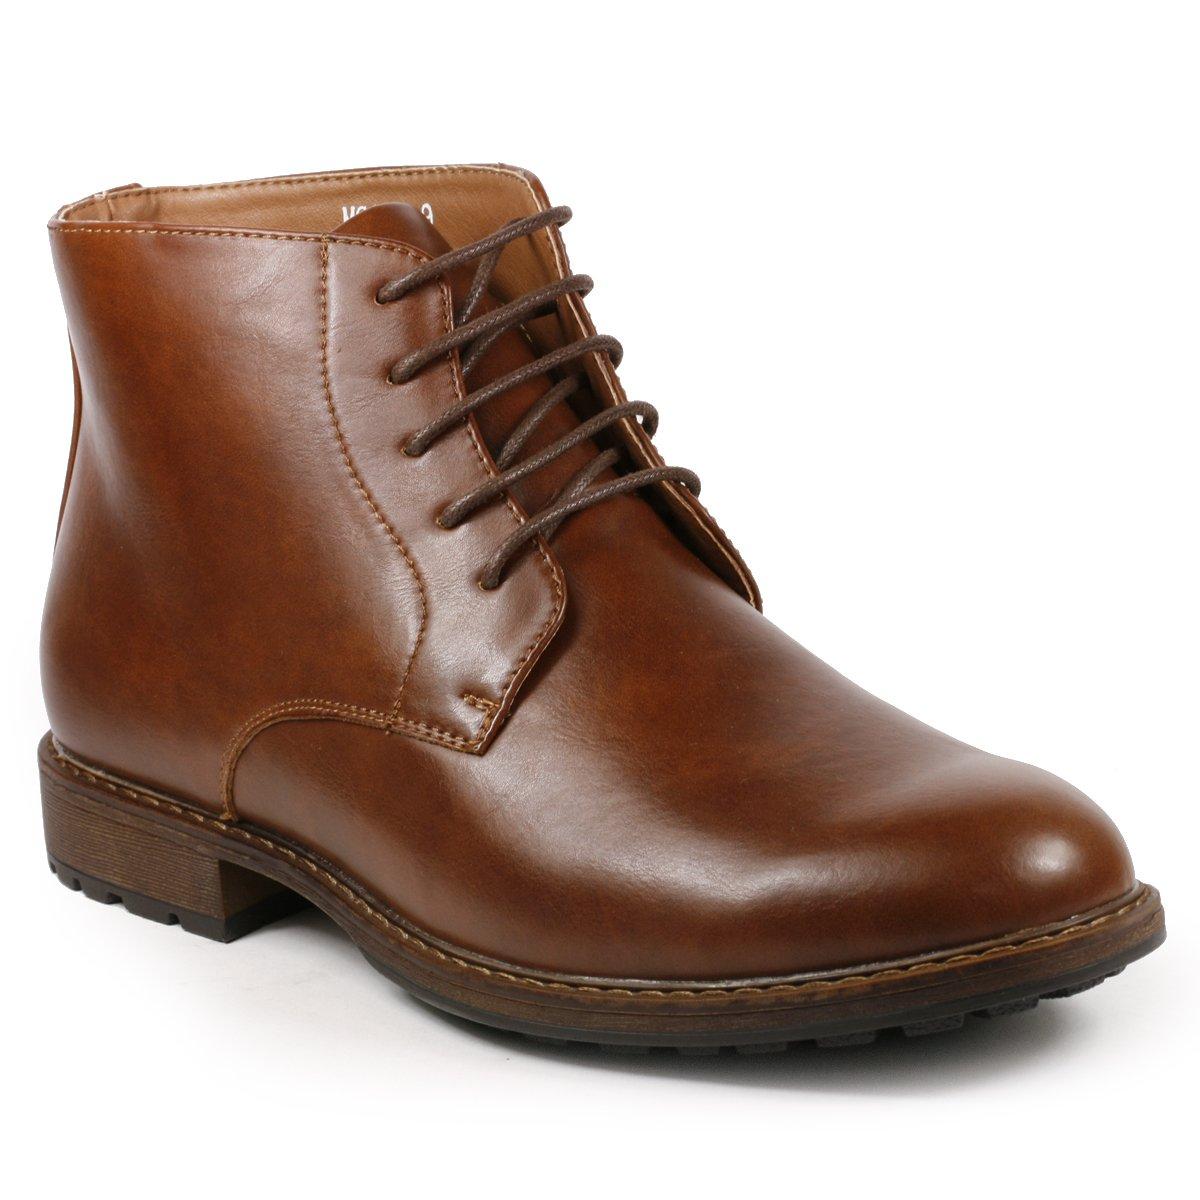 Metrocharm MC132 Men's Lace up Casual Fashion Ankle Chukka Boots (10, Brown) by Metrocharm